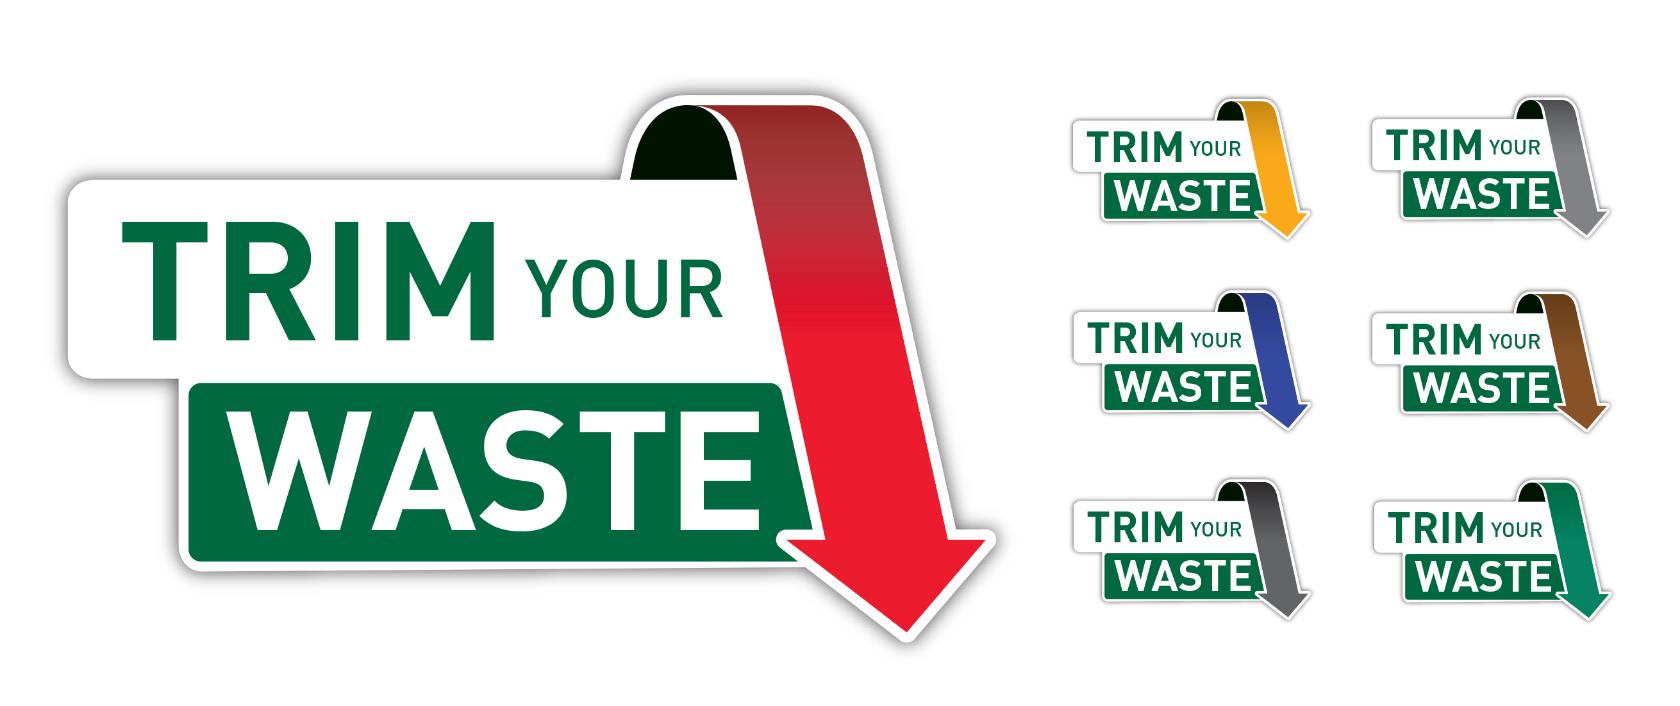 Wasteco - Trim Your Waste Logo - Colour variation